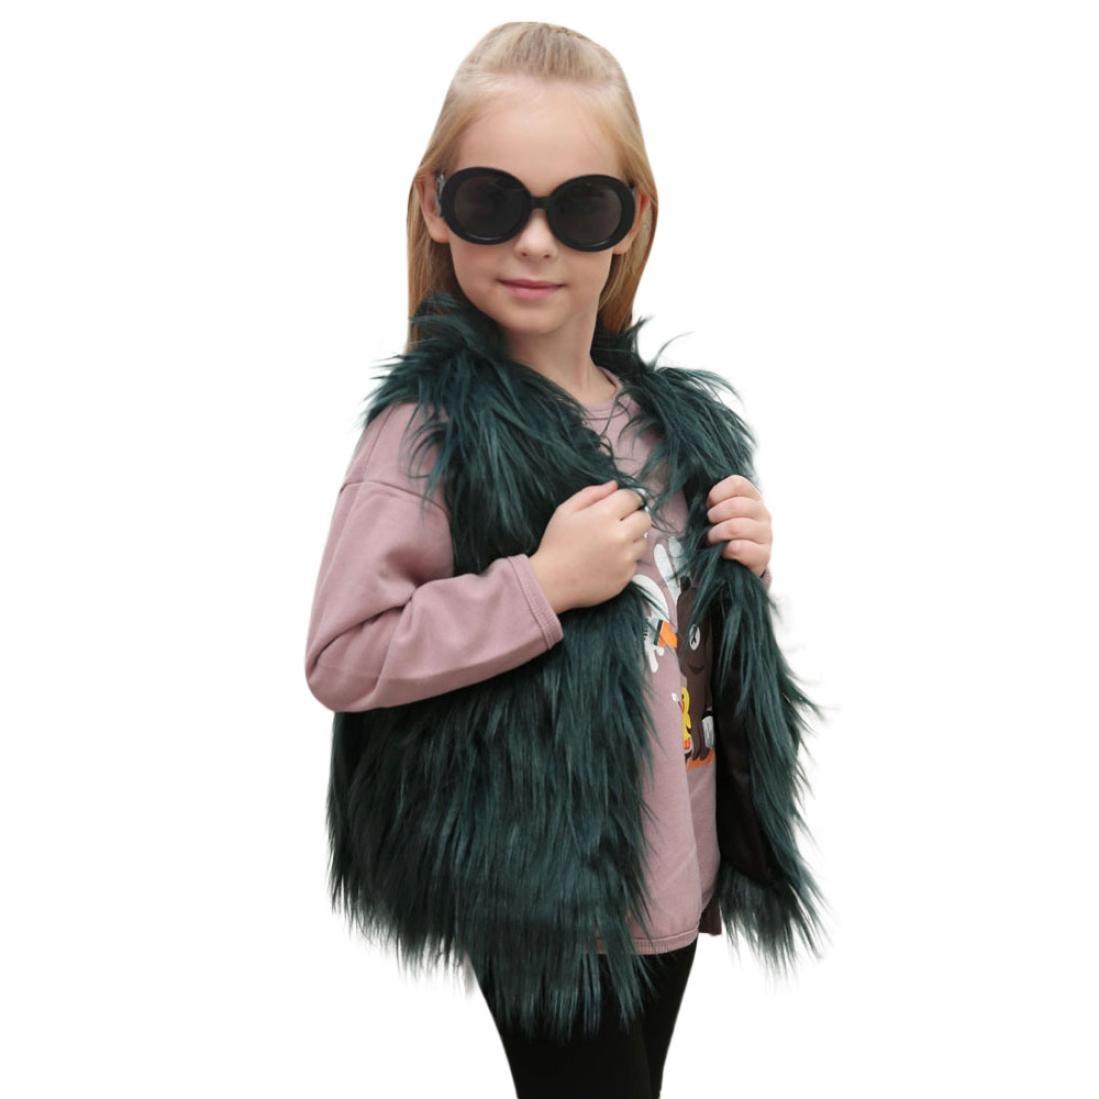 Baby Winter Coat, Egmy Cute Kid Baby Girl Autumn Winter Faux Fur Waistcoat Thick Coat Warm Outwear Clothes (5T, Green)